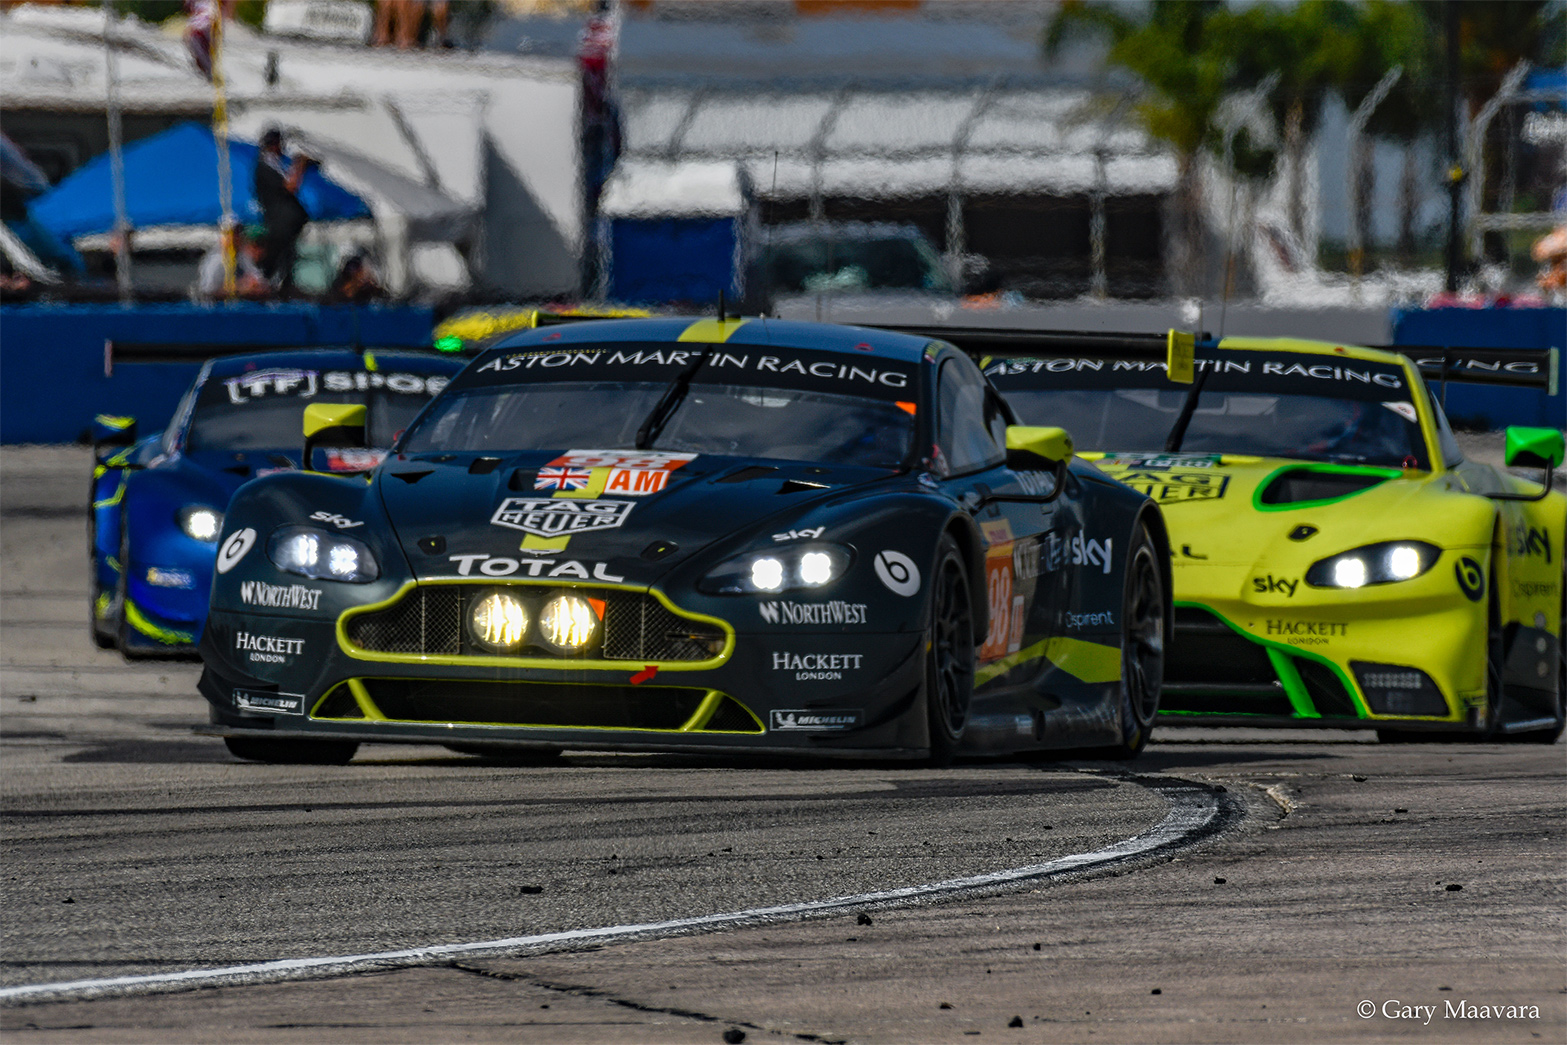 TrackWorthy - FIA WEC_race_hour one_#98_Aston Martin Vantage_ lap one